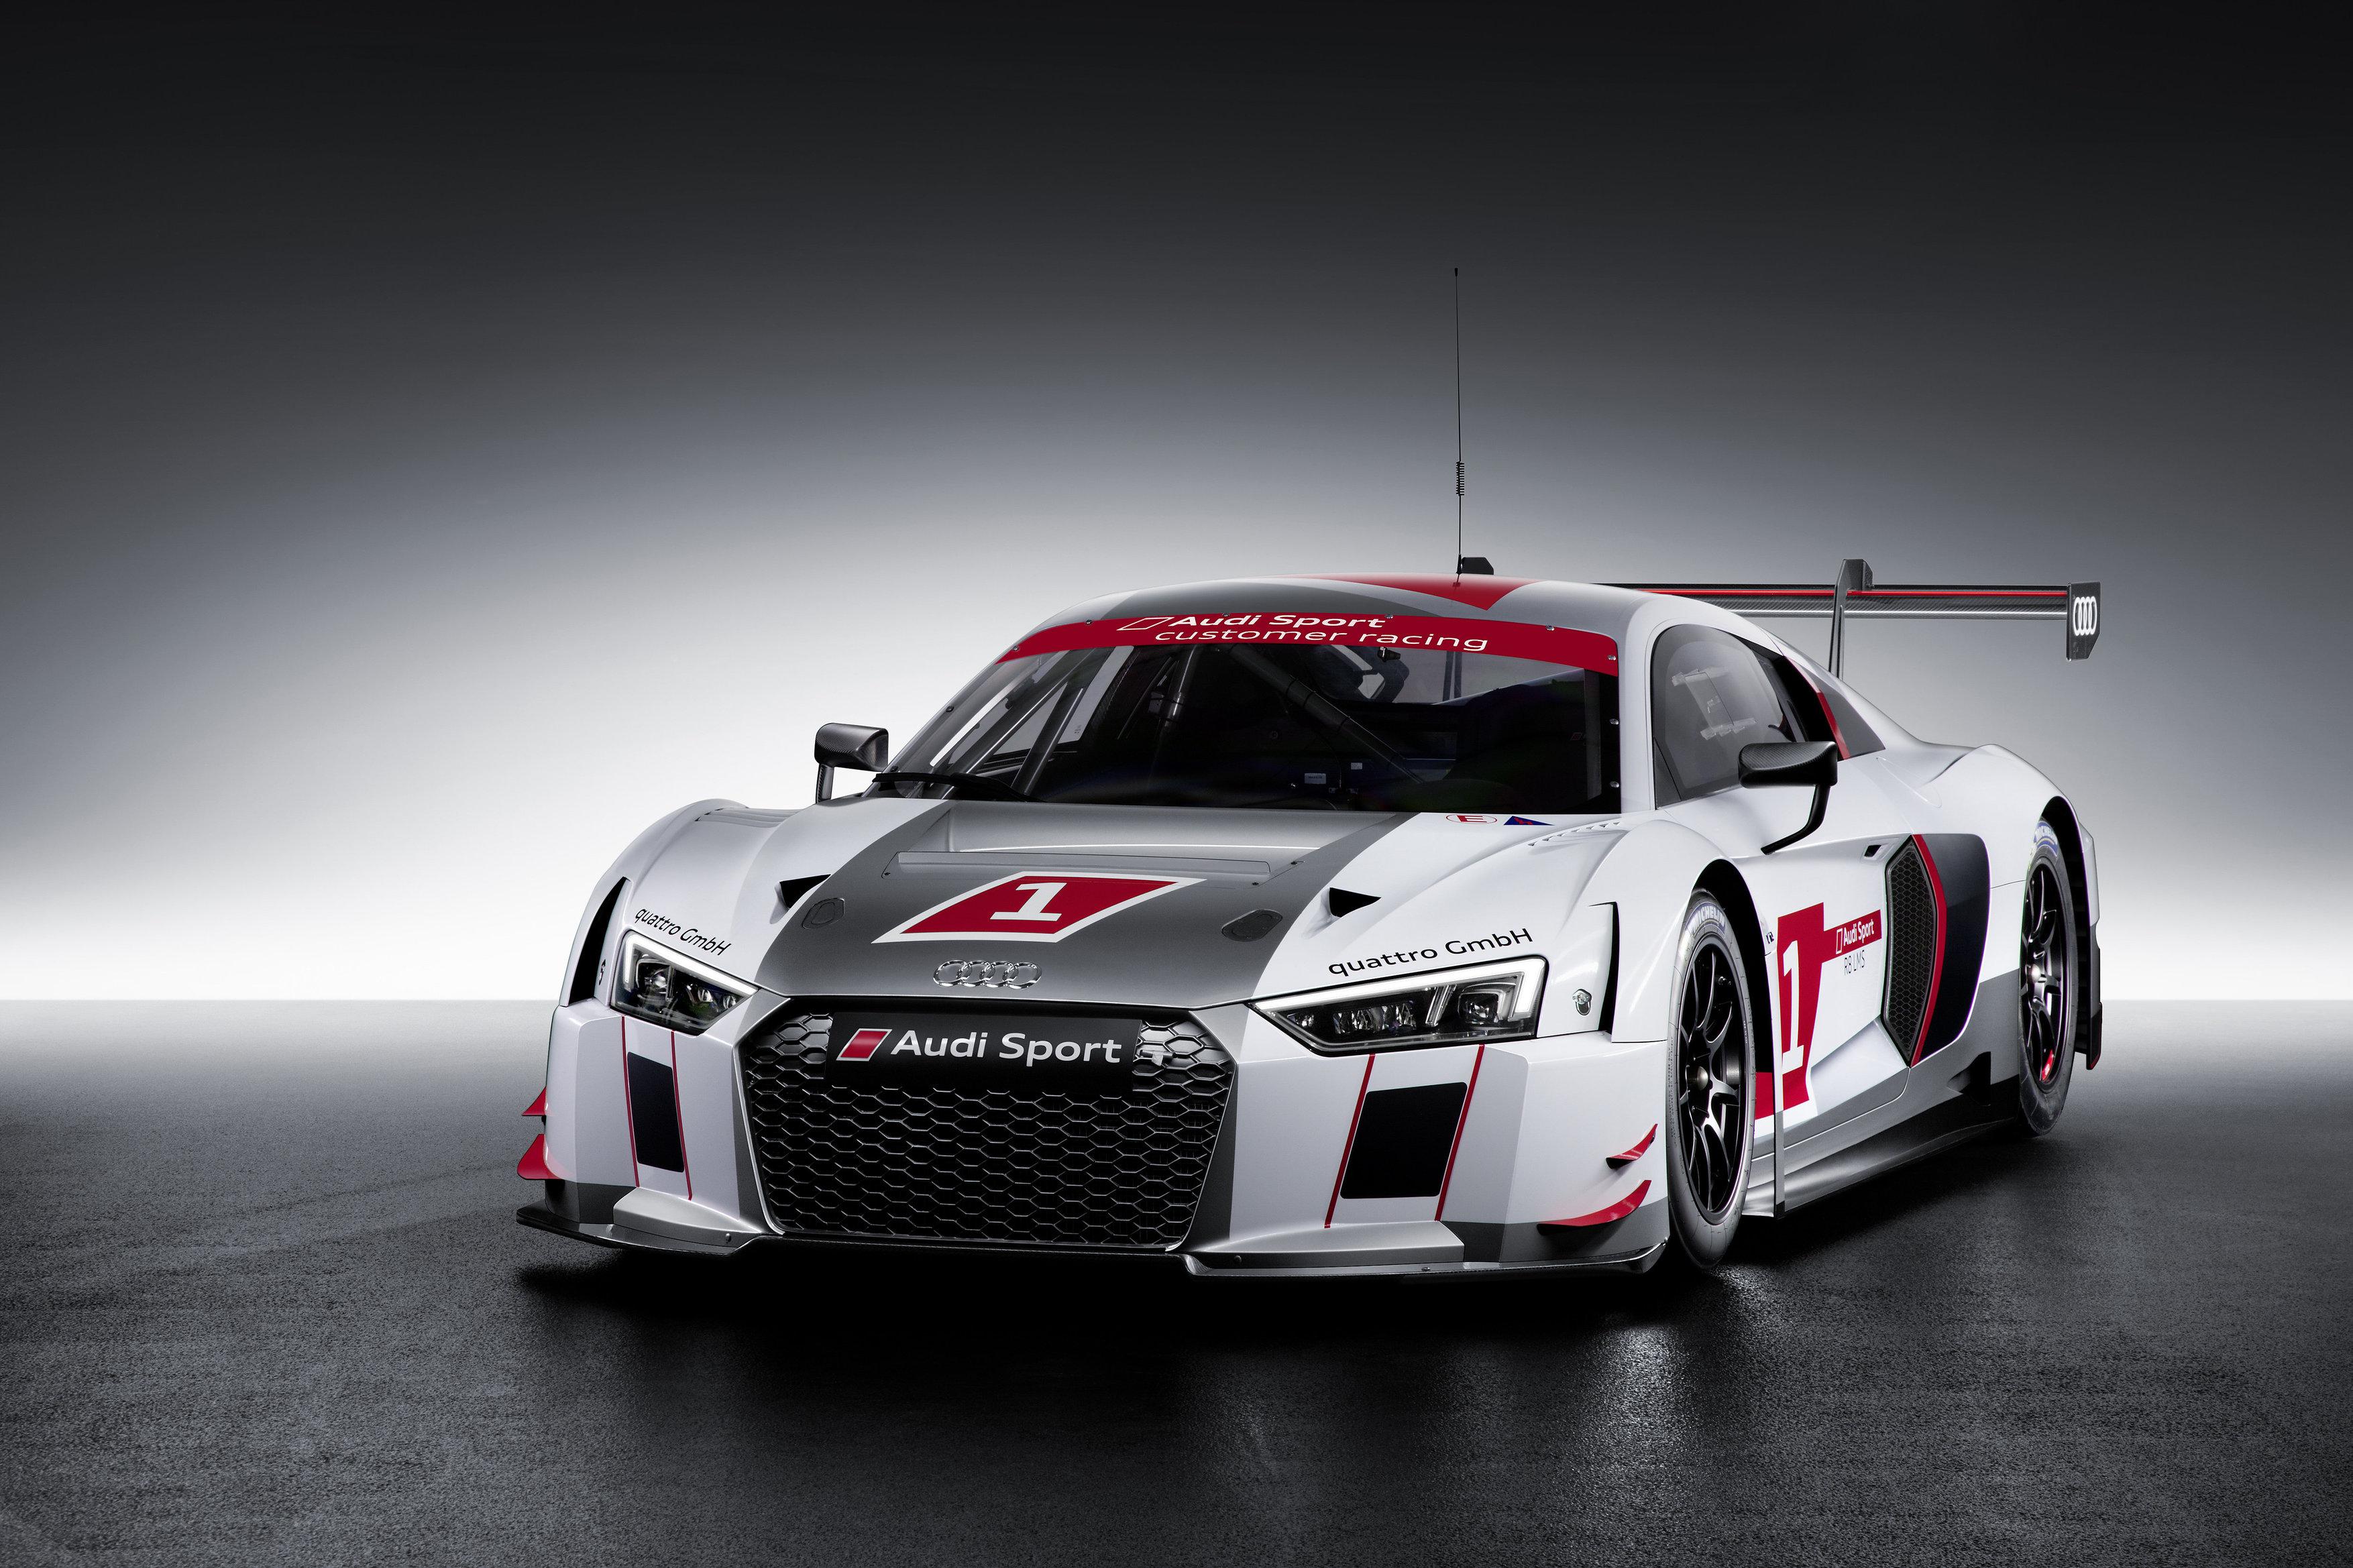 Audi R8 LMS establishes new race car generation